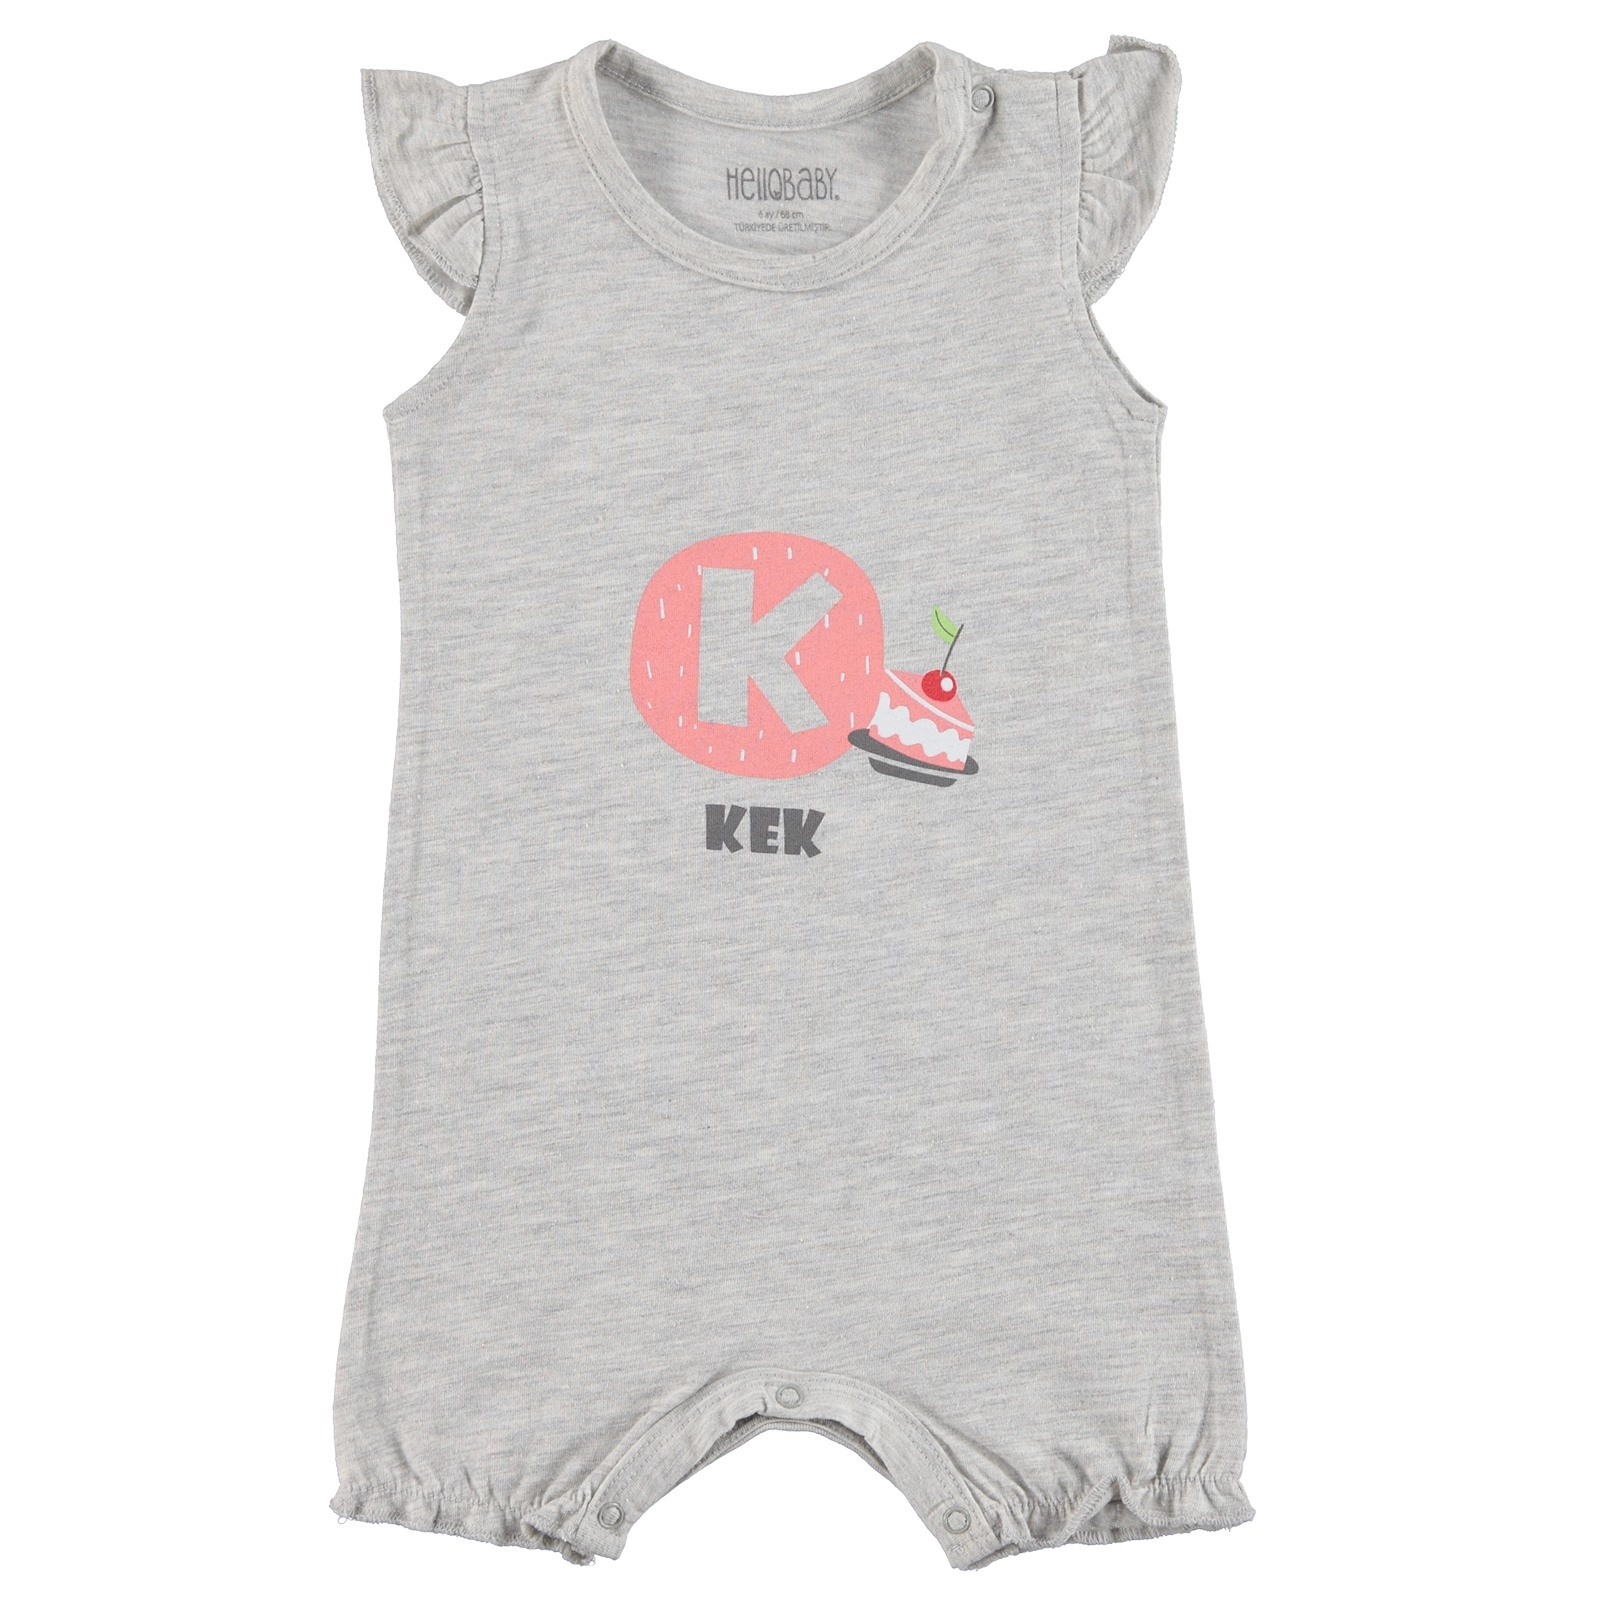 Ebebek HelloBaby Summer Baby Girl Ruffled Jumpsuit